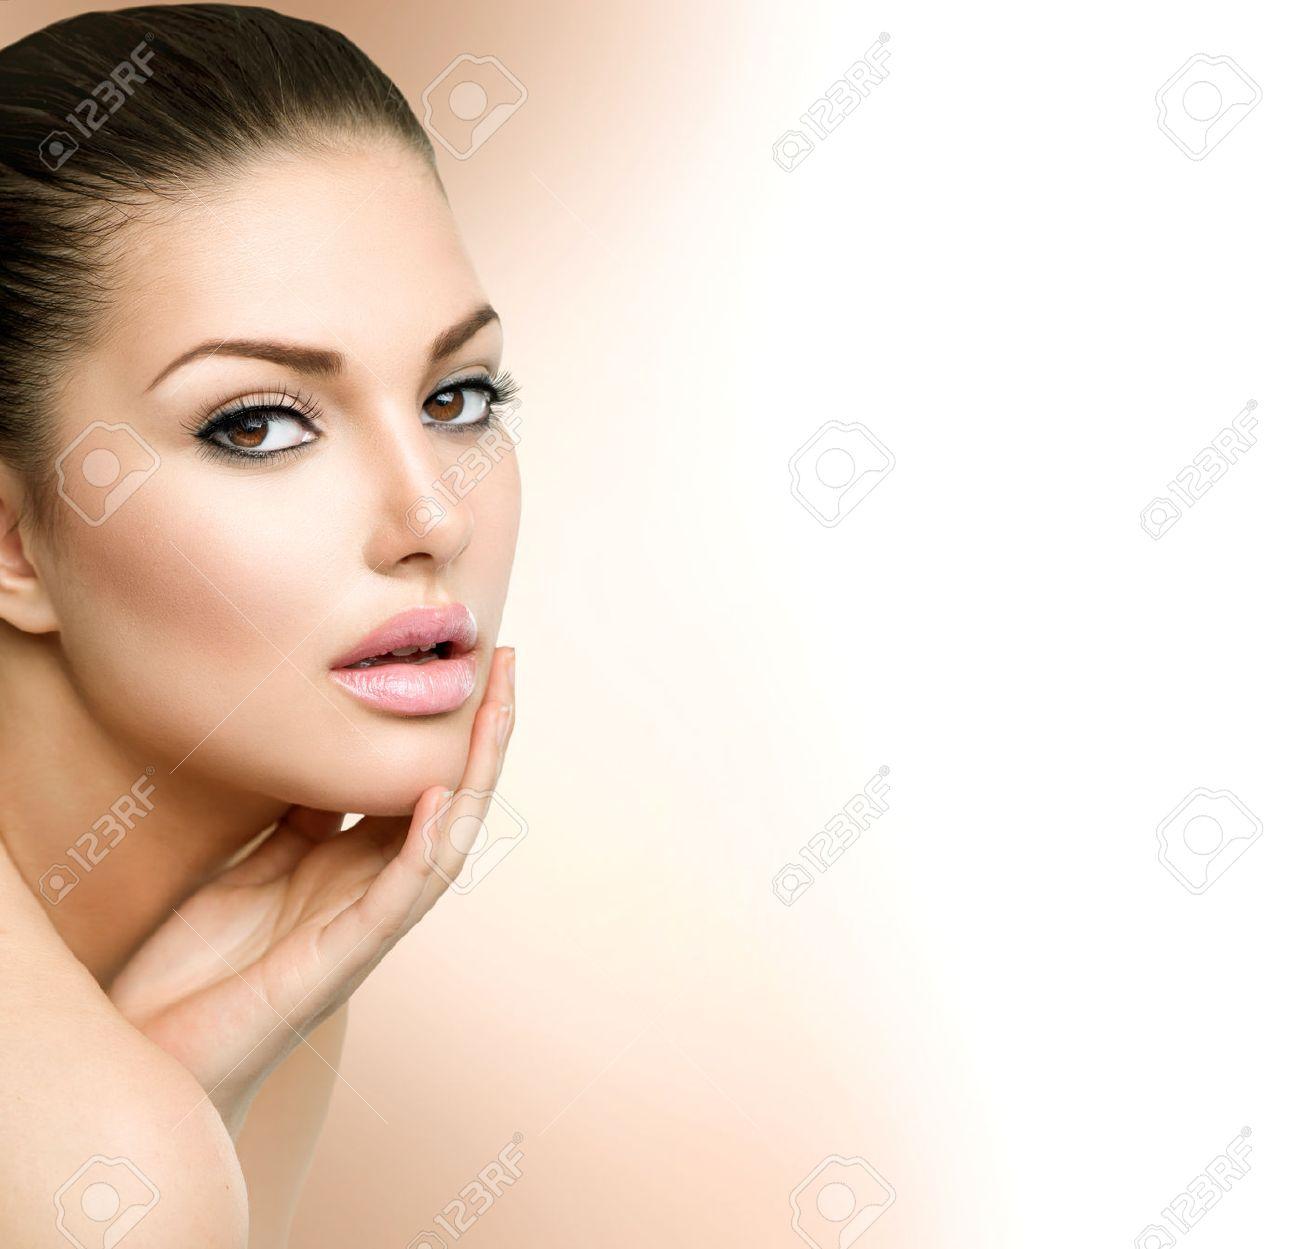 Beauty Spa Woman Portrait  Beautiful Girl Touching her Face Stock Photo - 28867921